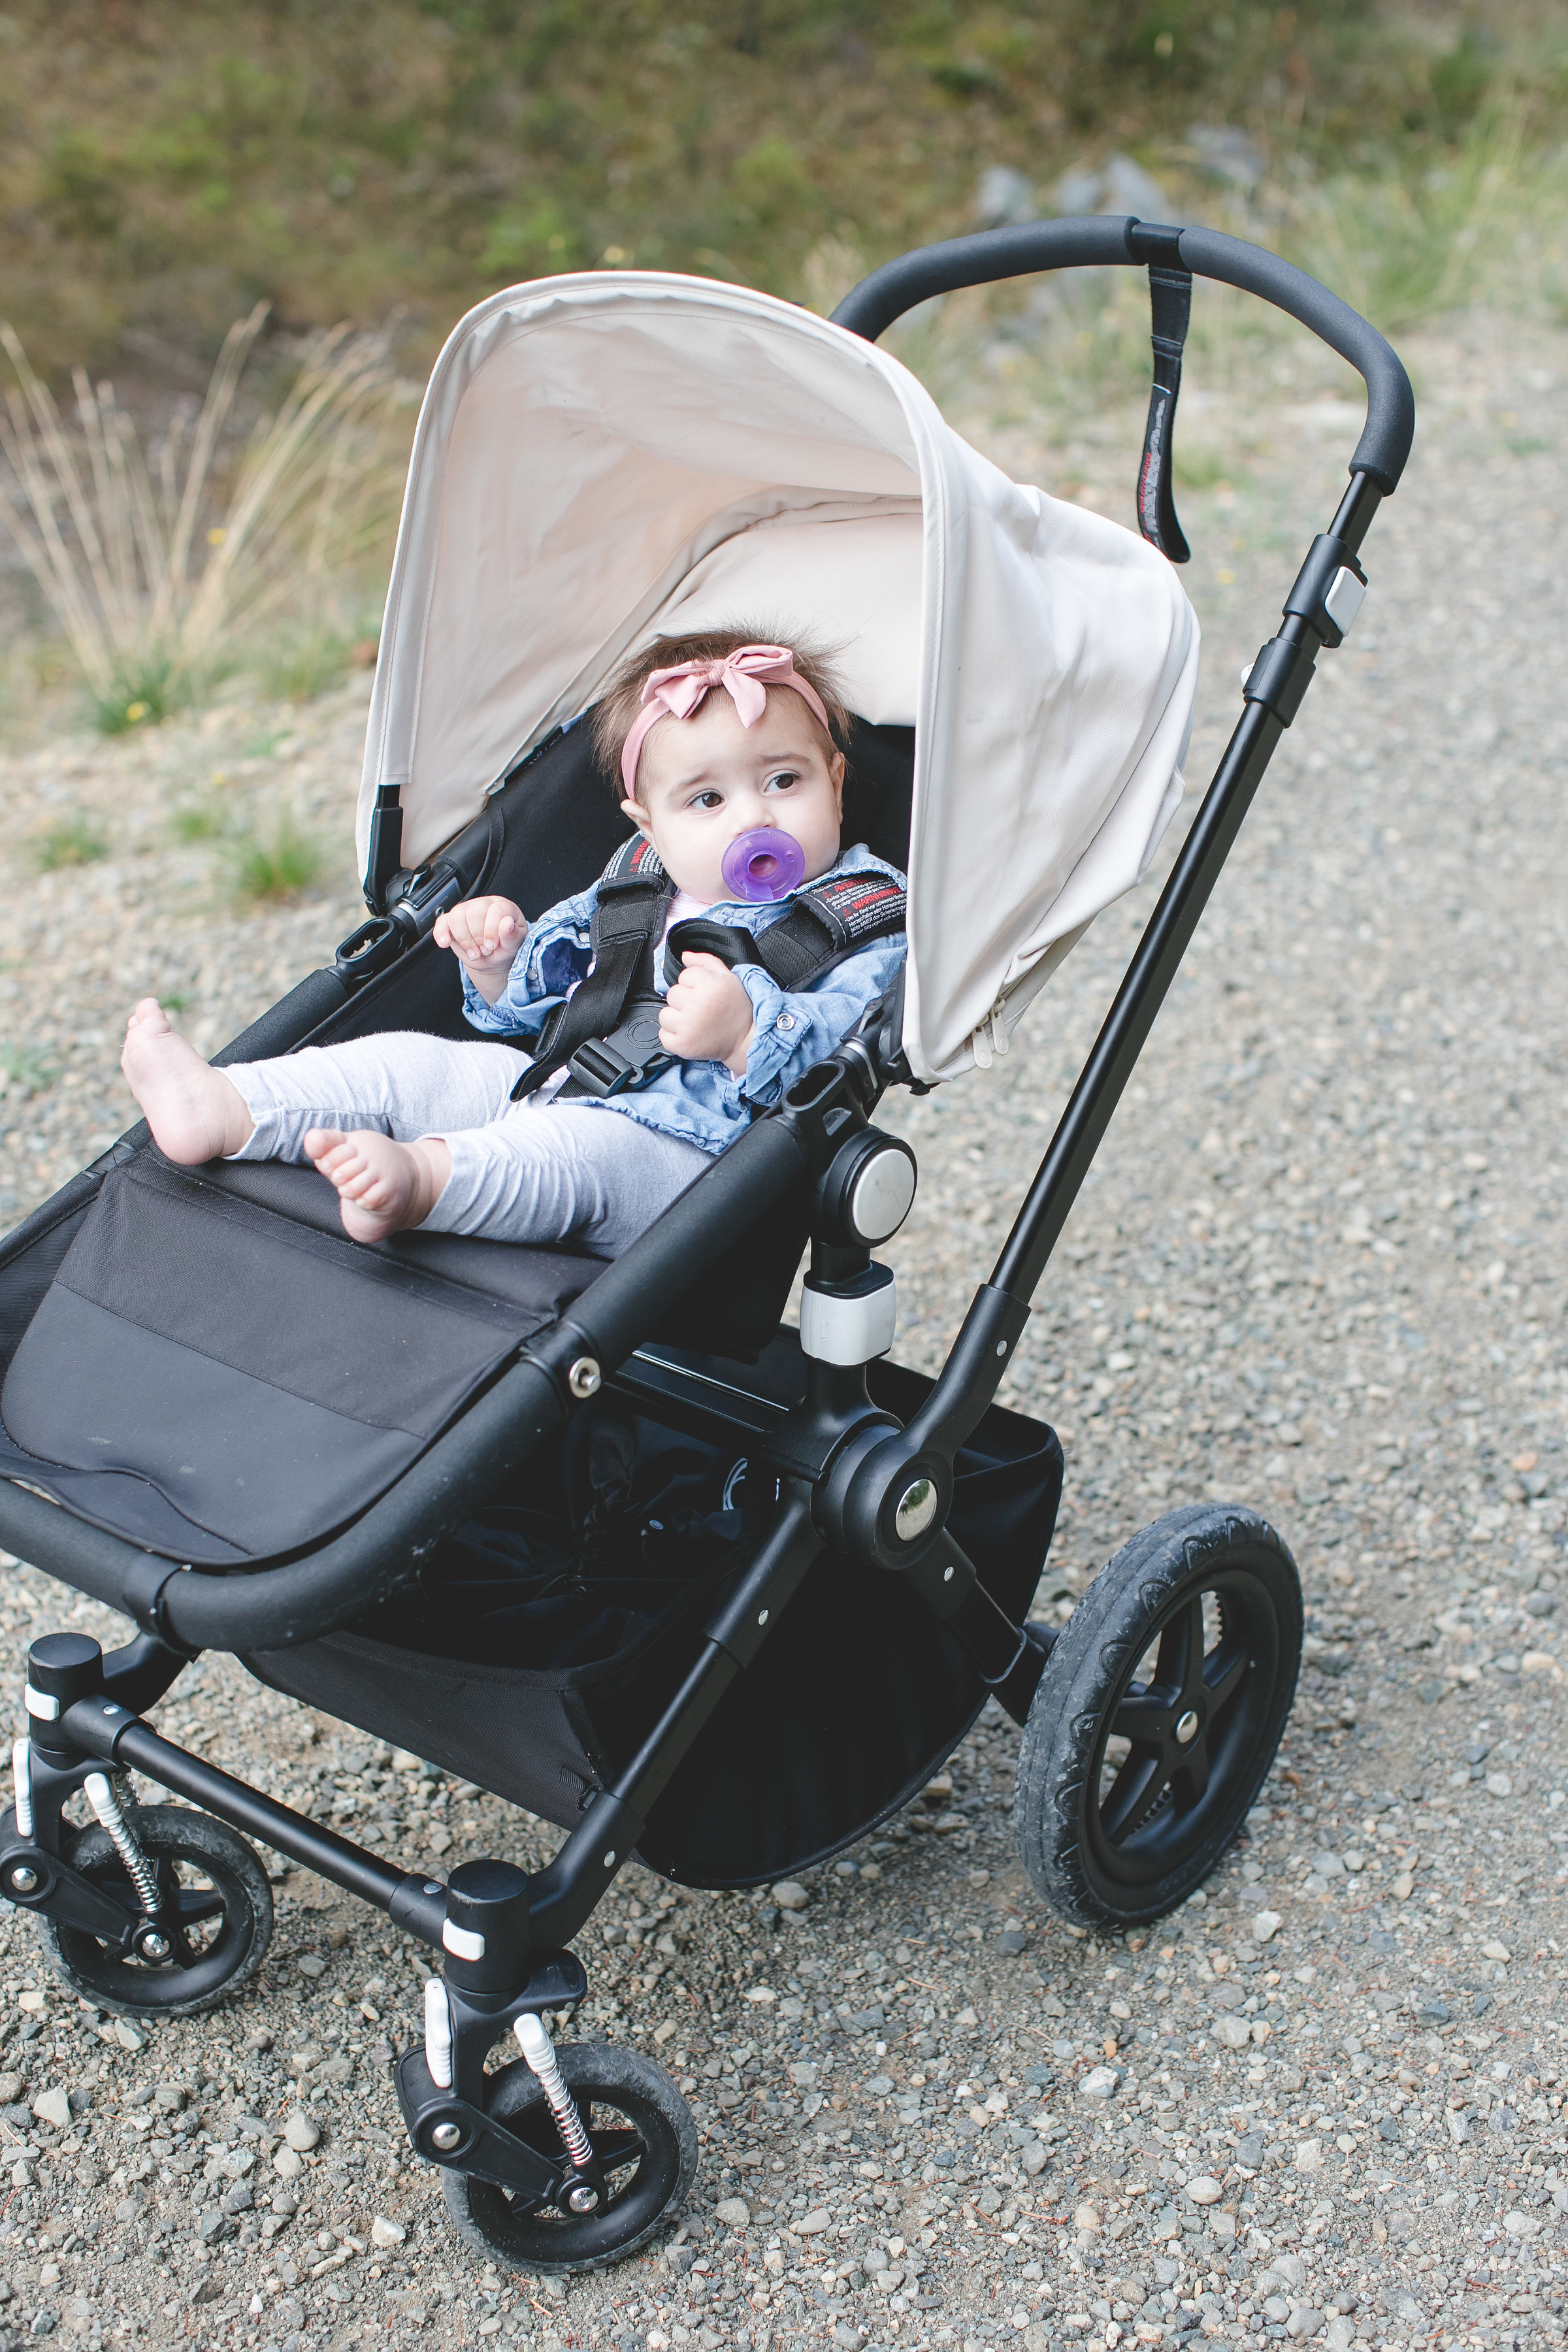 Choosing the best Stroller